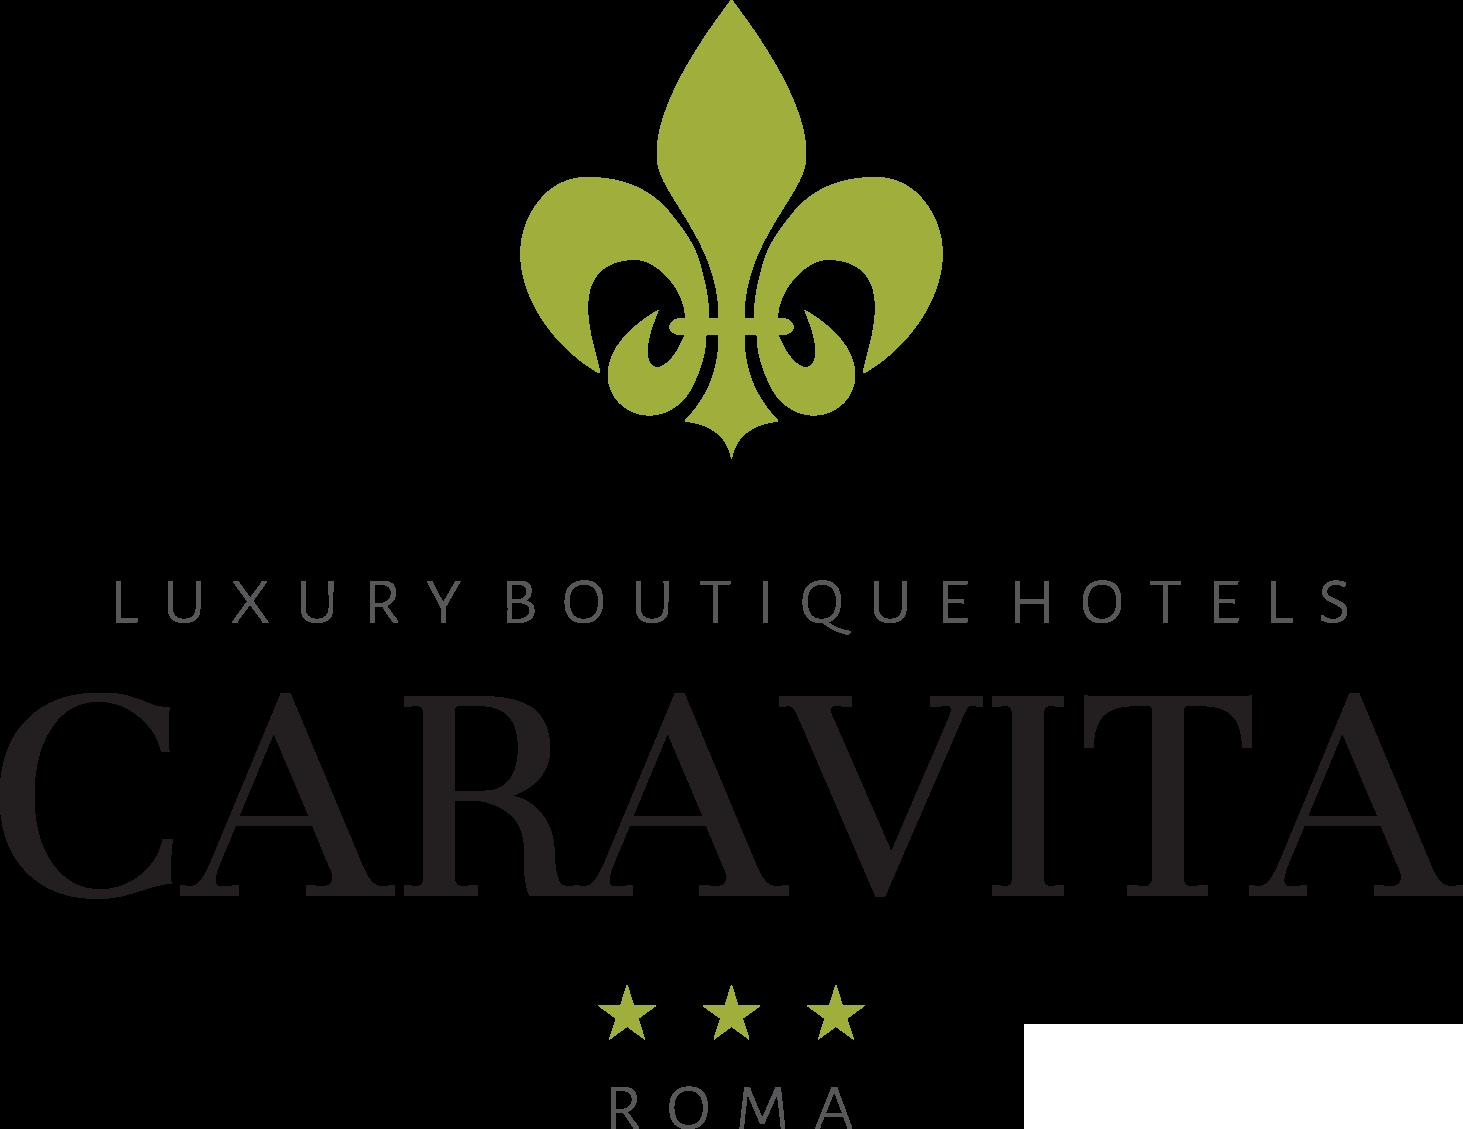 Caravita Hotel